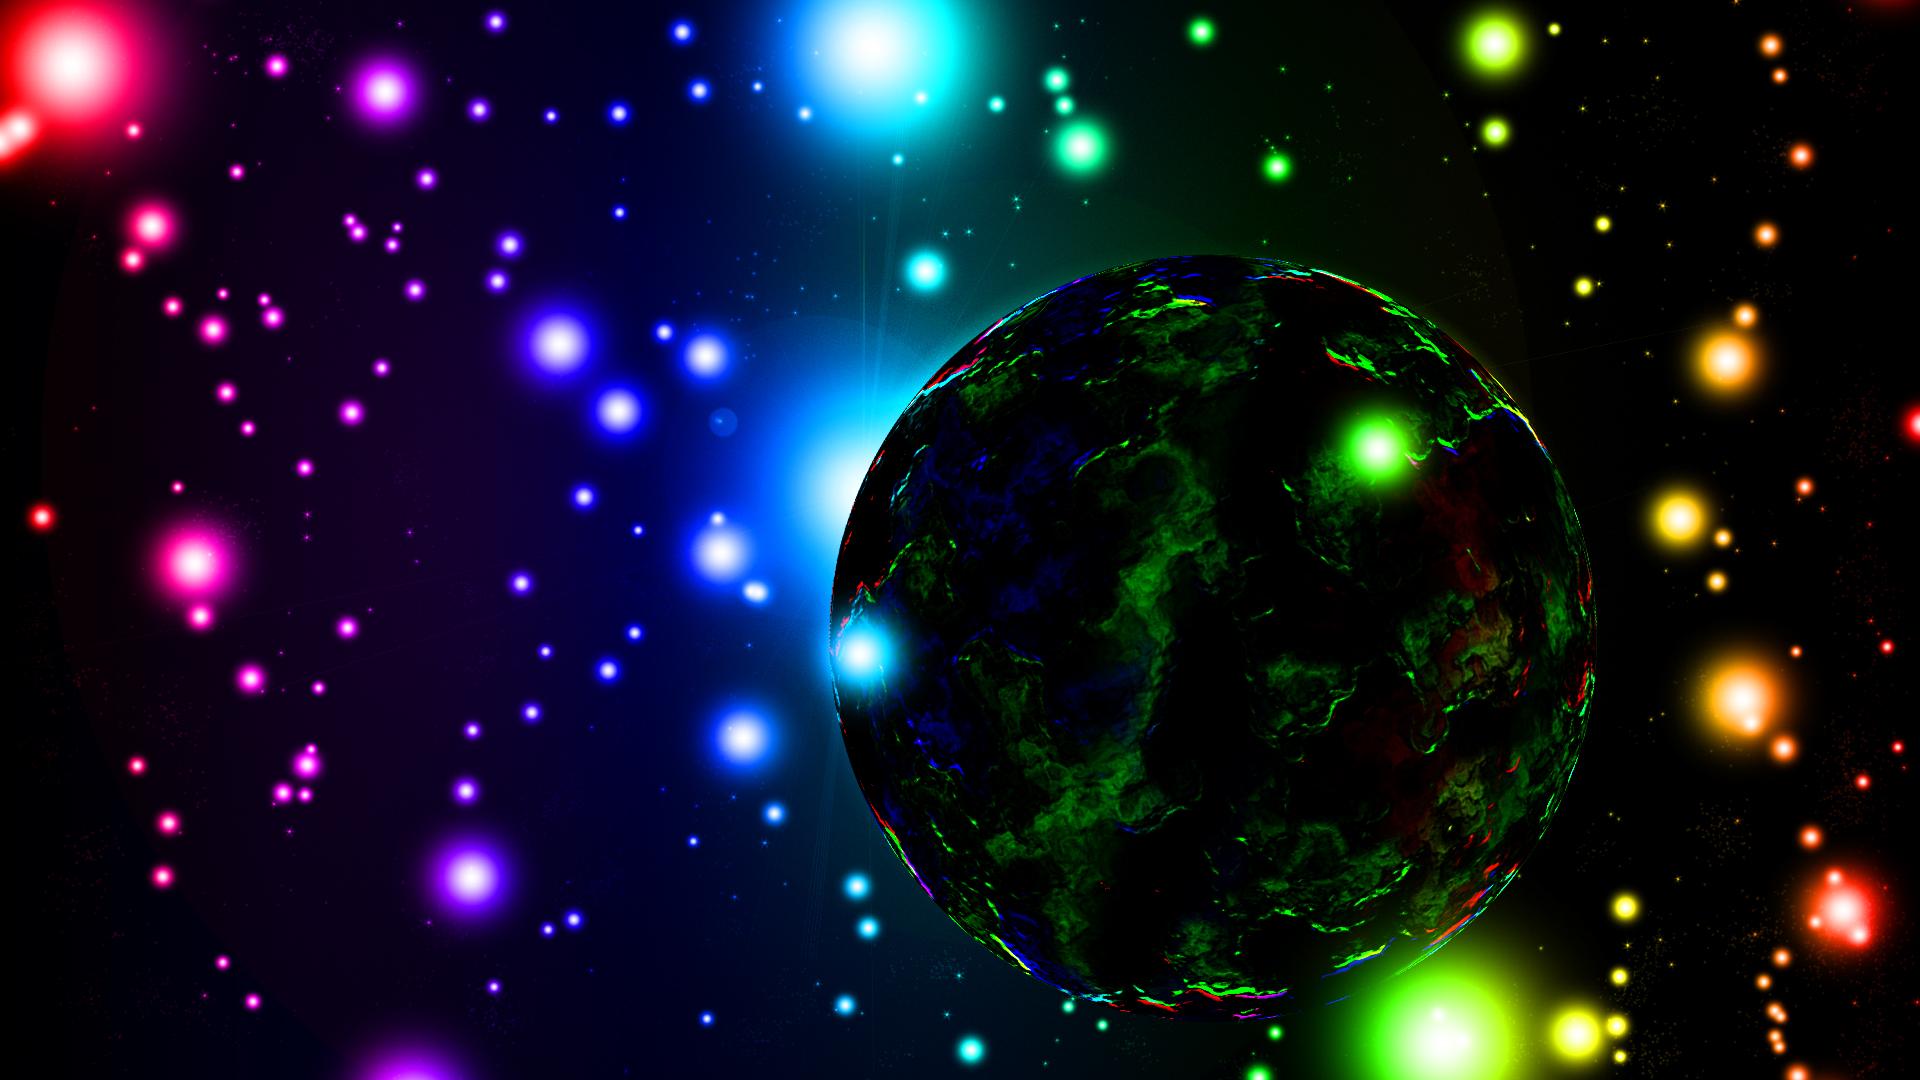 colorful spacetxvirus on deviantart